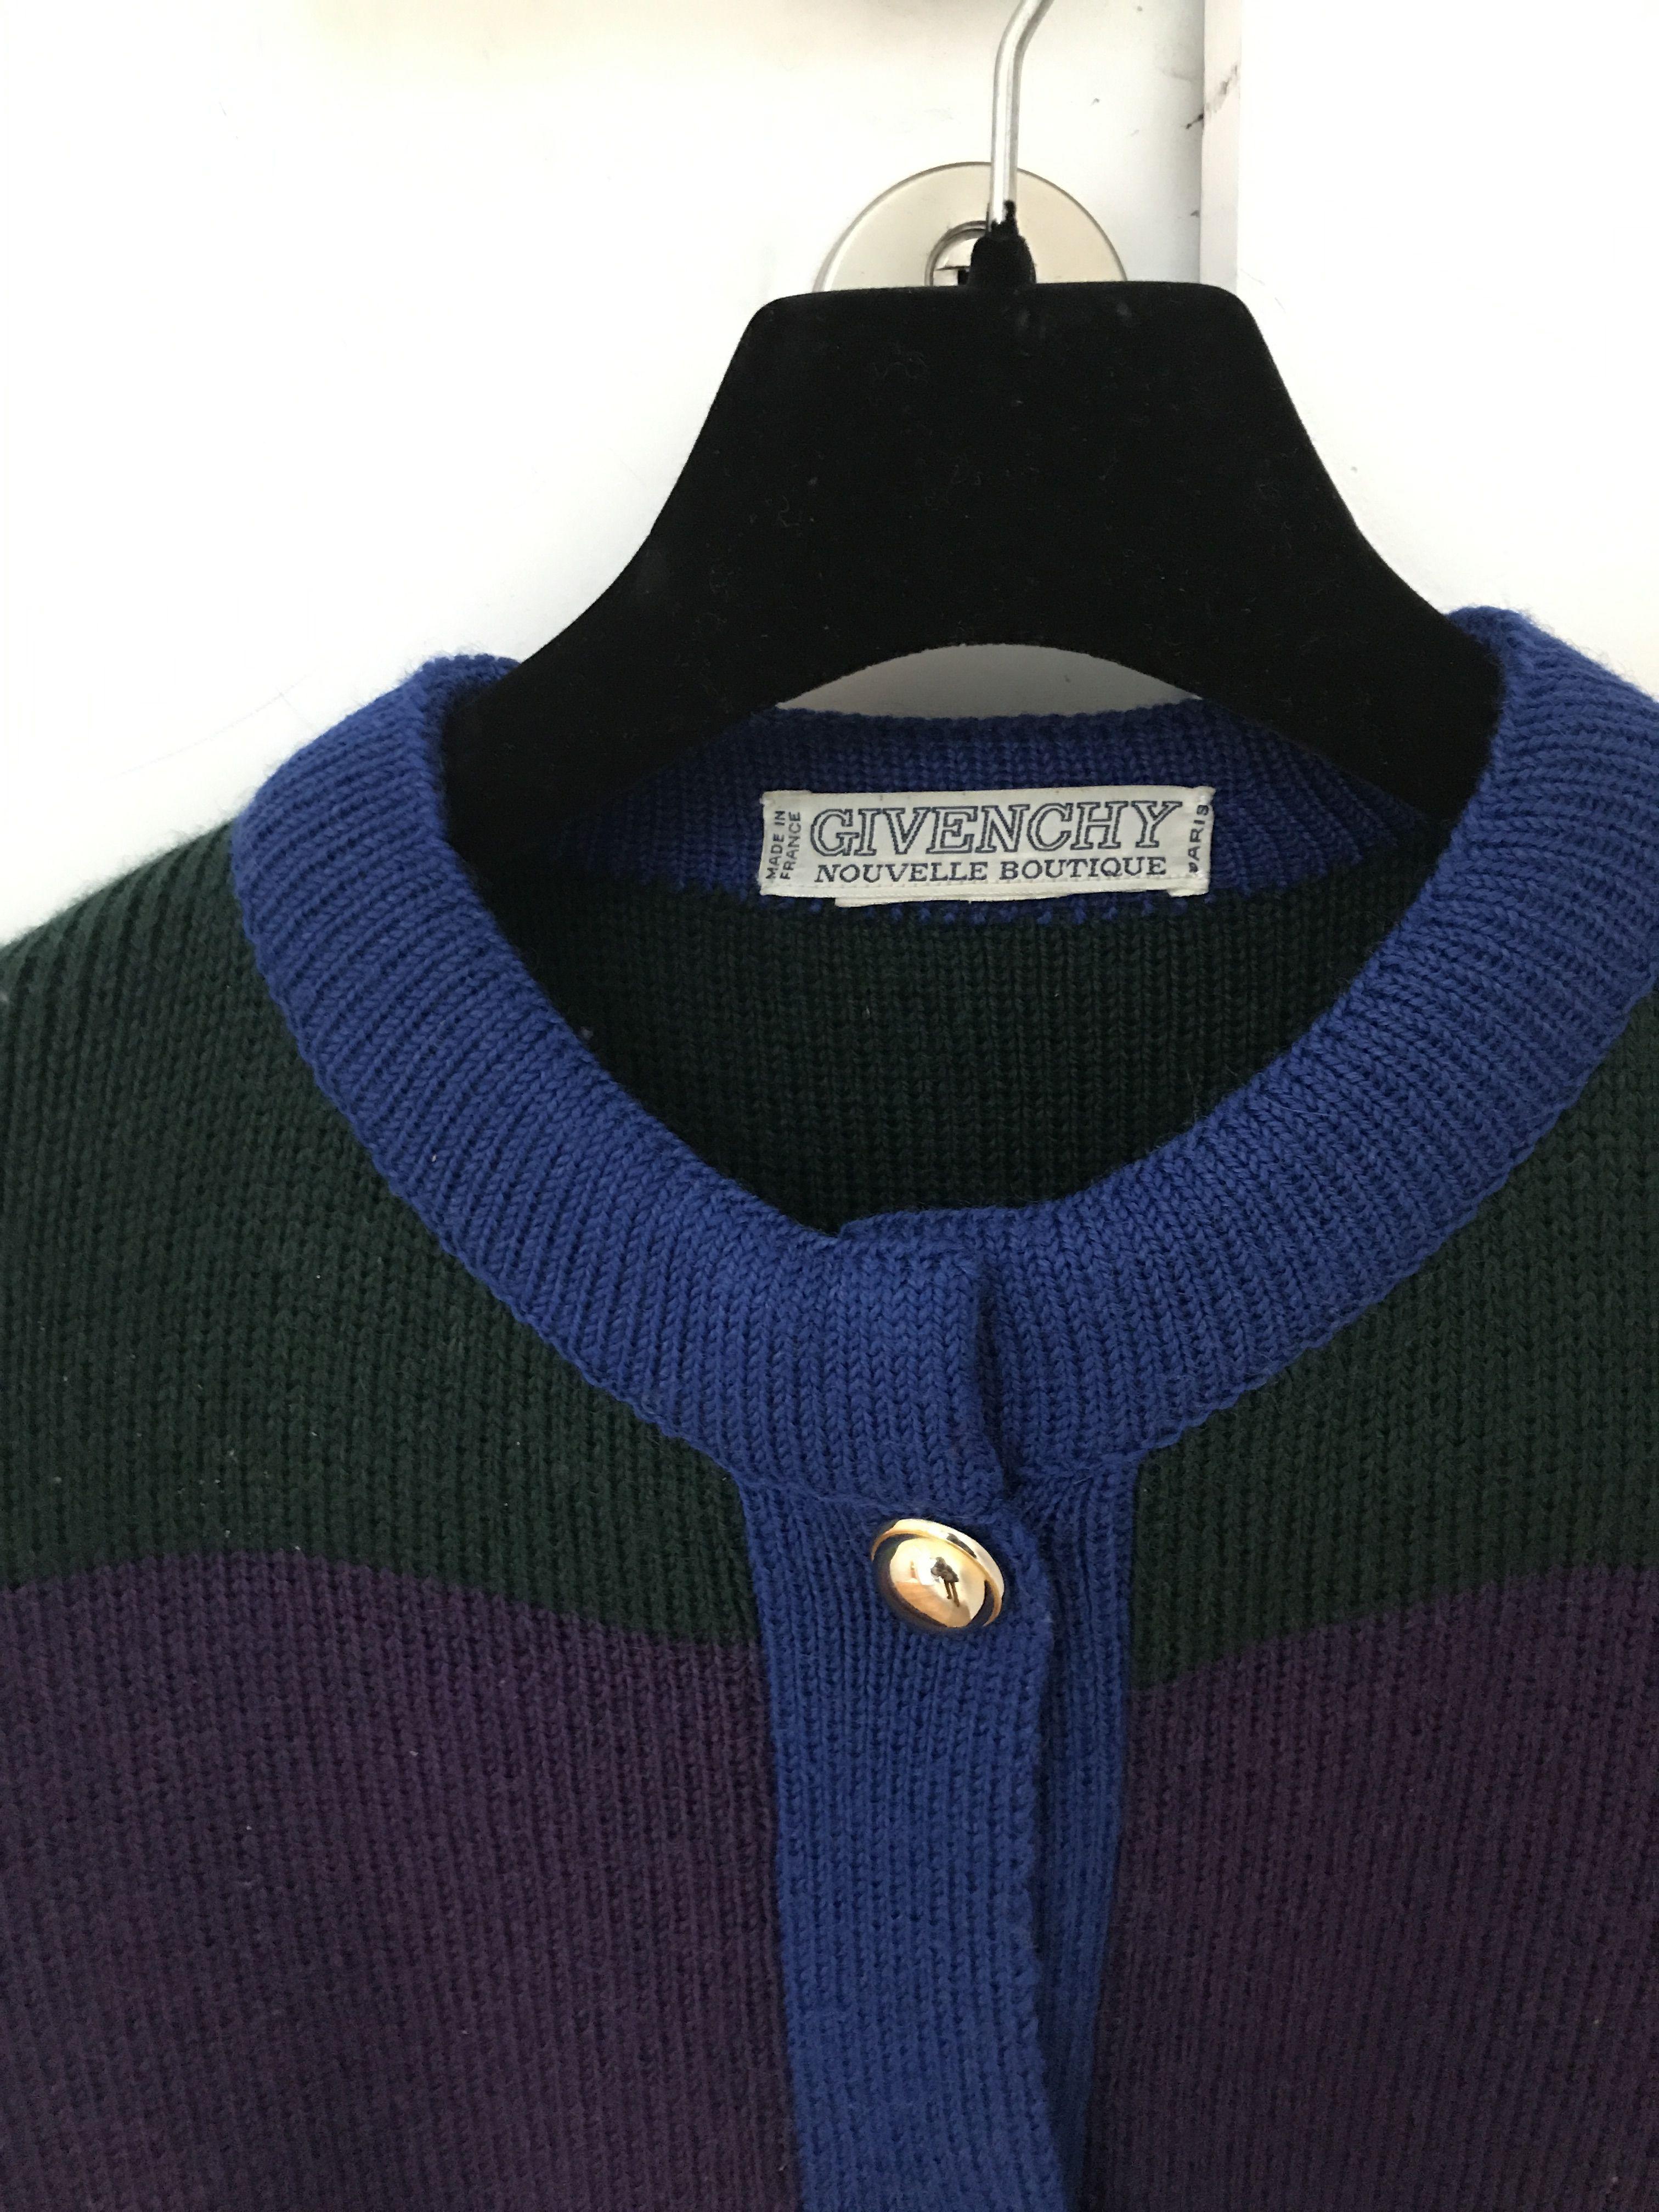 Pulls - Cardigan Givenchy